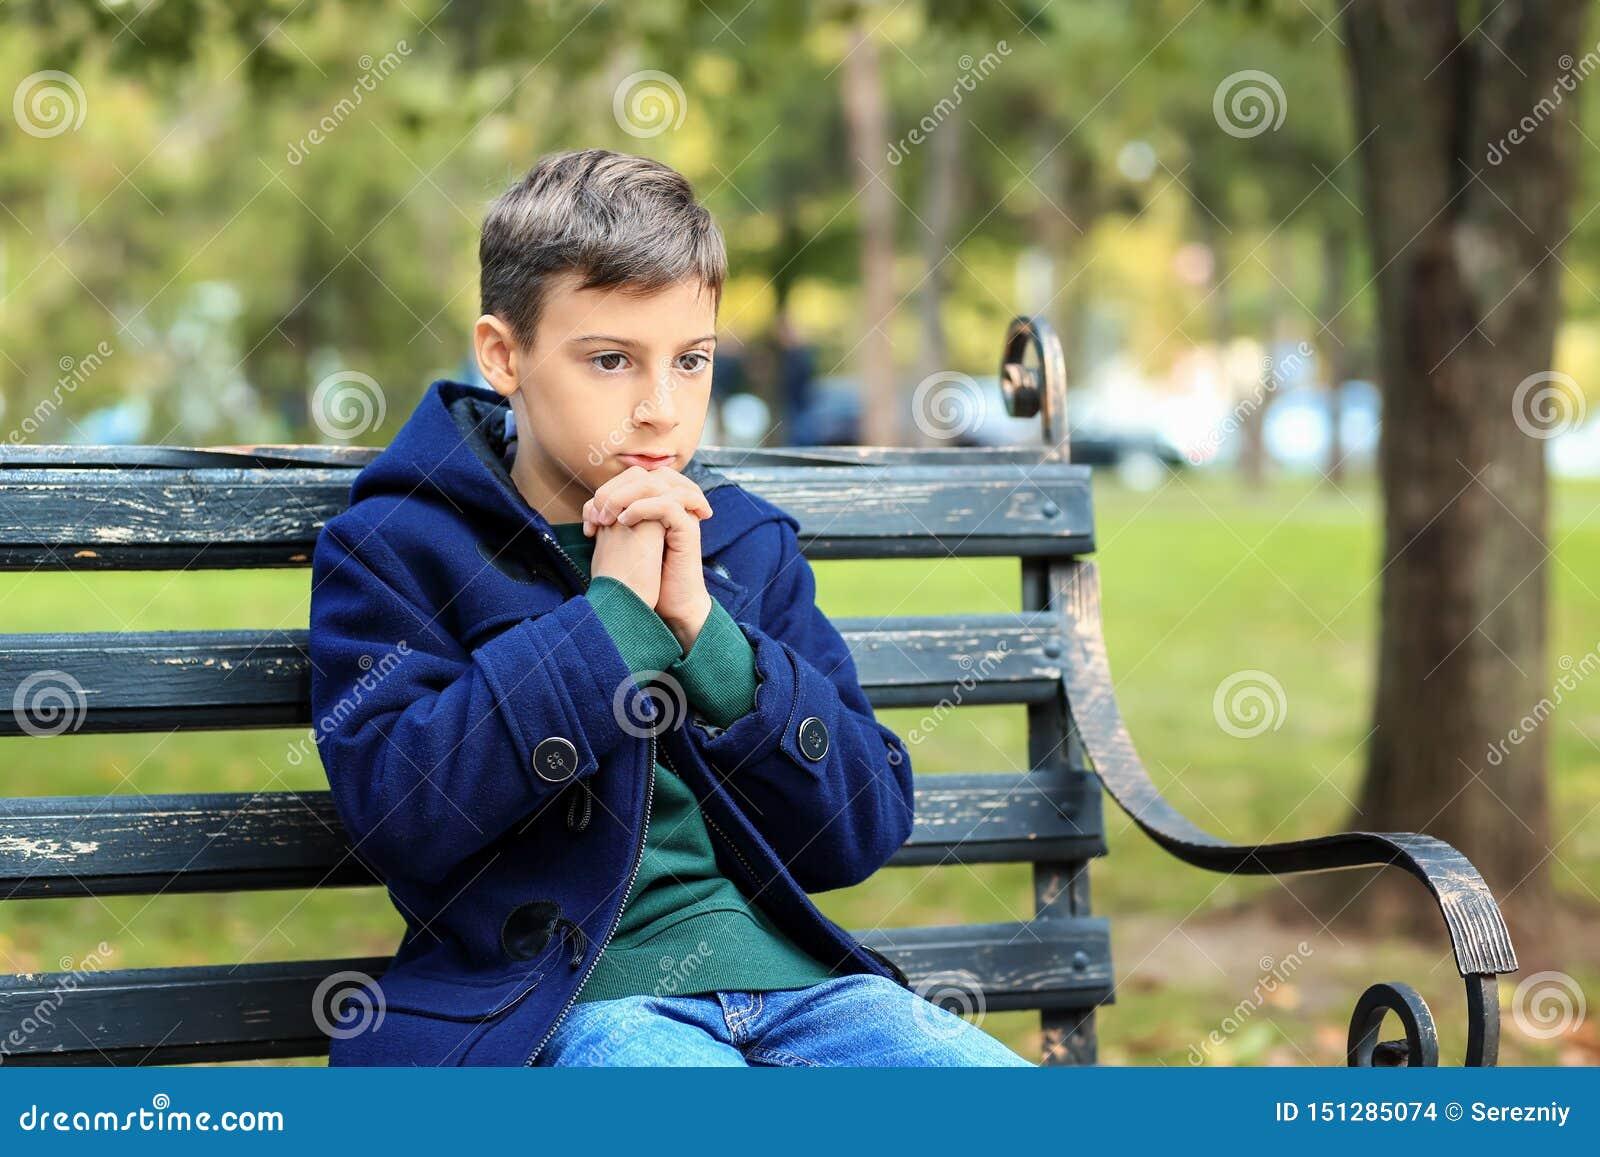 Praying little boy sitting on bench in park